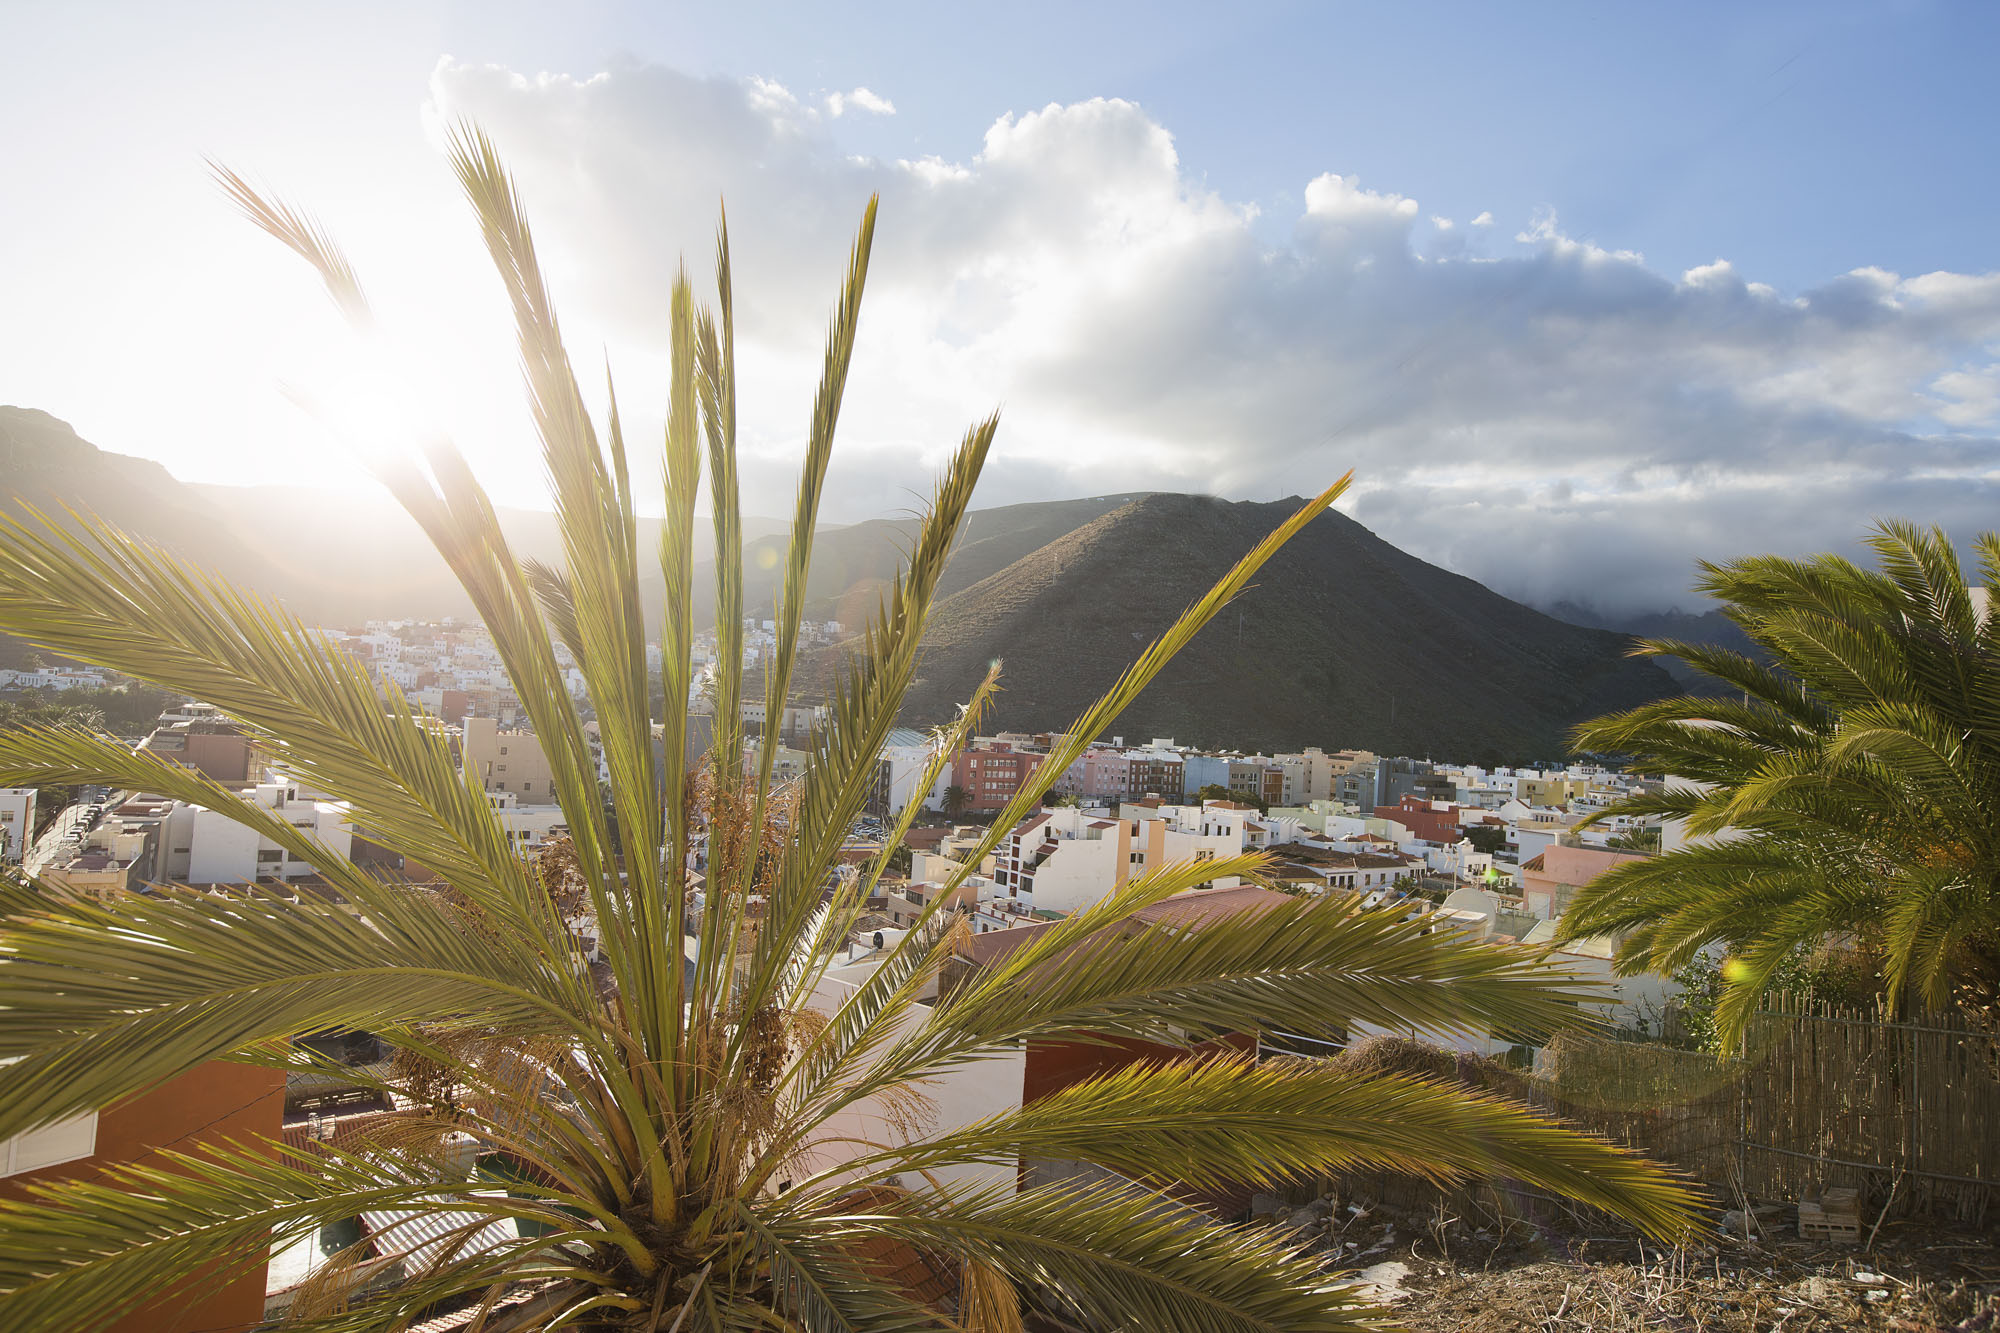 Spanien, Kanarische Inseln, La Gomera, San Sebastian de La Gomera, Inselhauptstadt, Blick über die Stadt